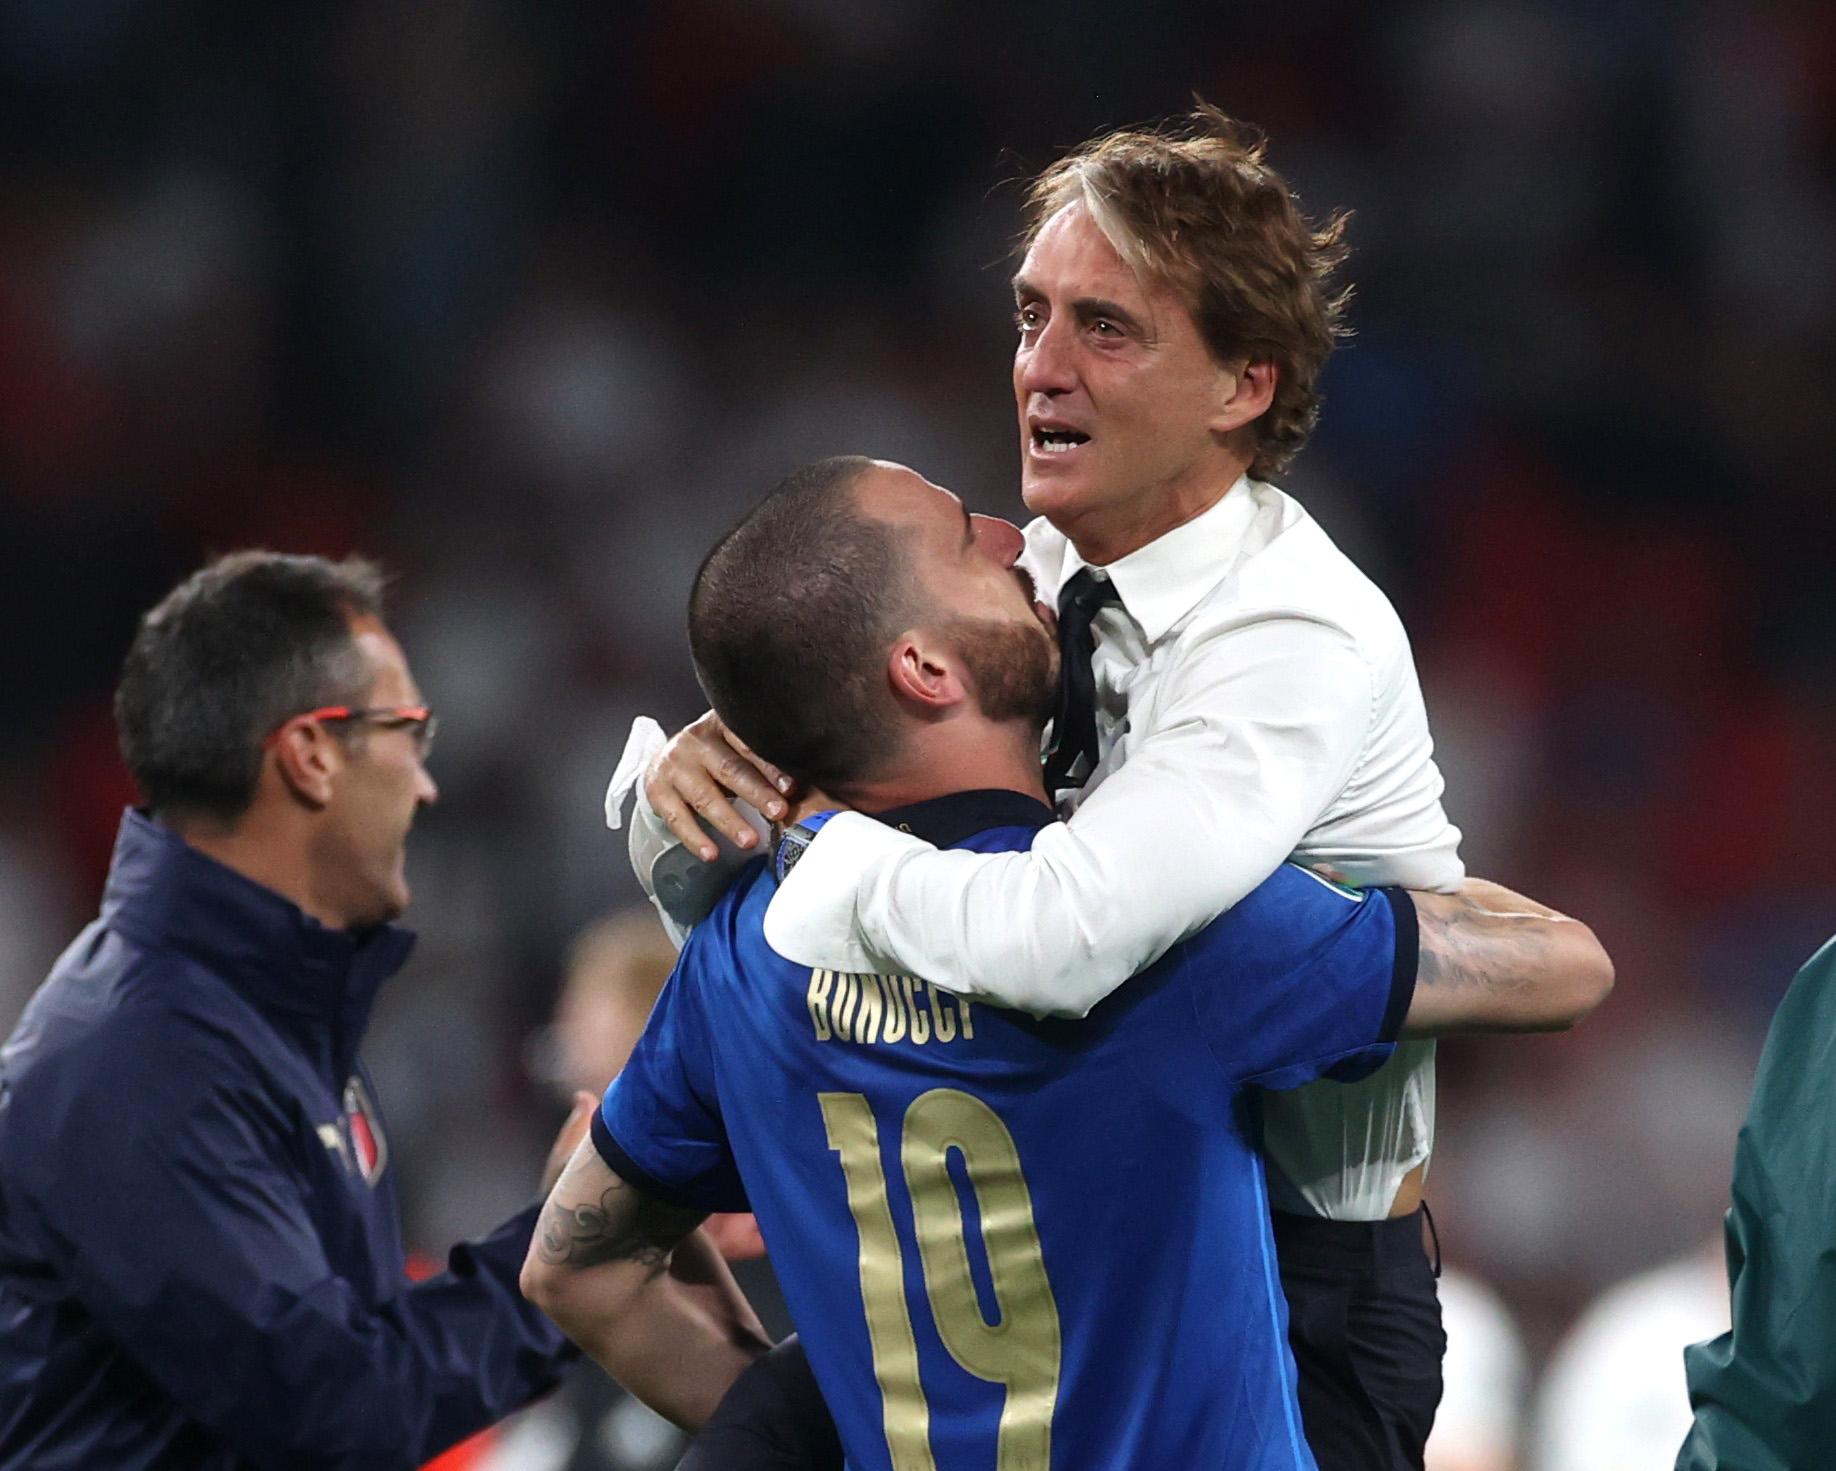 Euro 2020, Ιταλία – Αγγλία: Τα δάκρυα του Μαντσίνι και το «It's coming to Rome» από τον Μπονούτσι